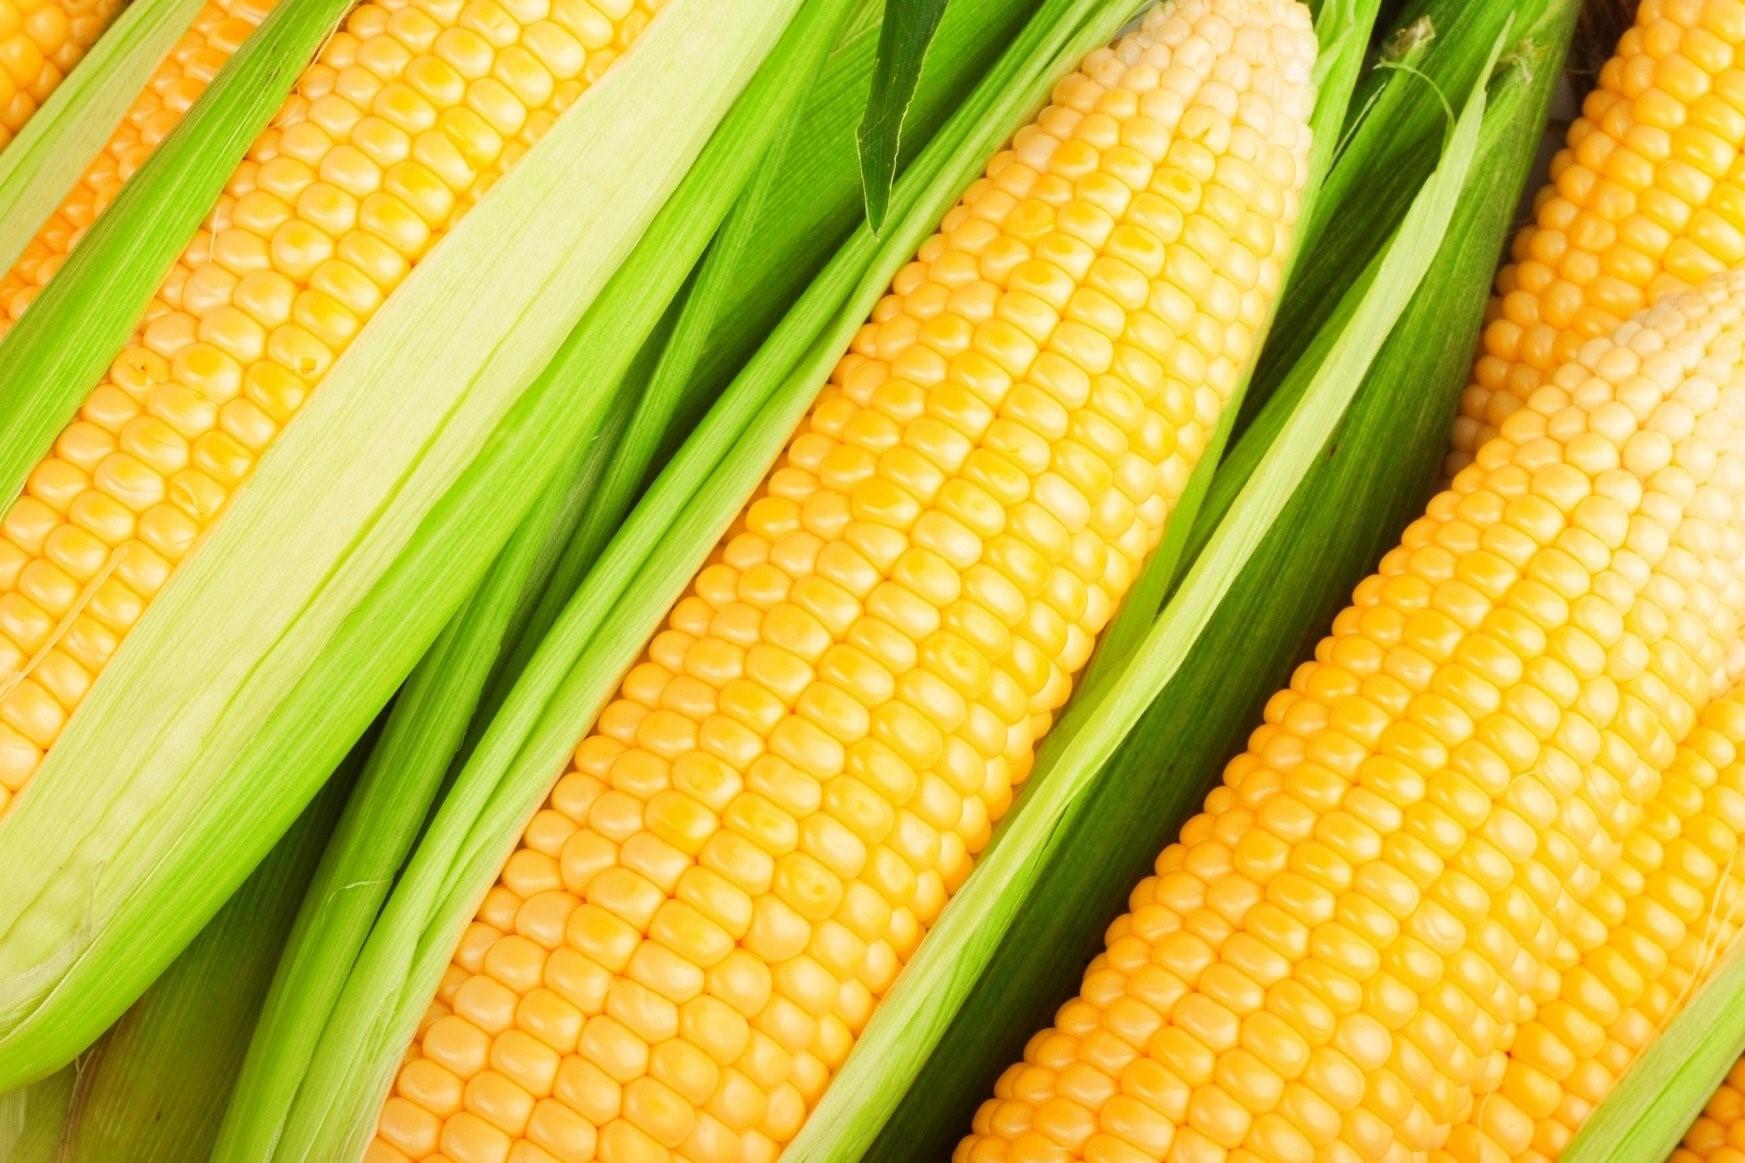 Прогноз цены на кукурузу в 2019 году в Украине - цена кукурузы